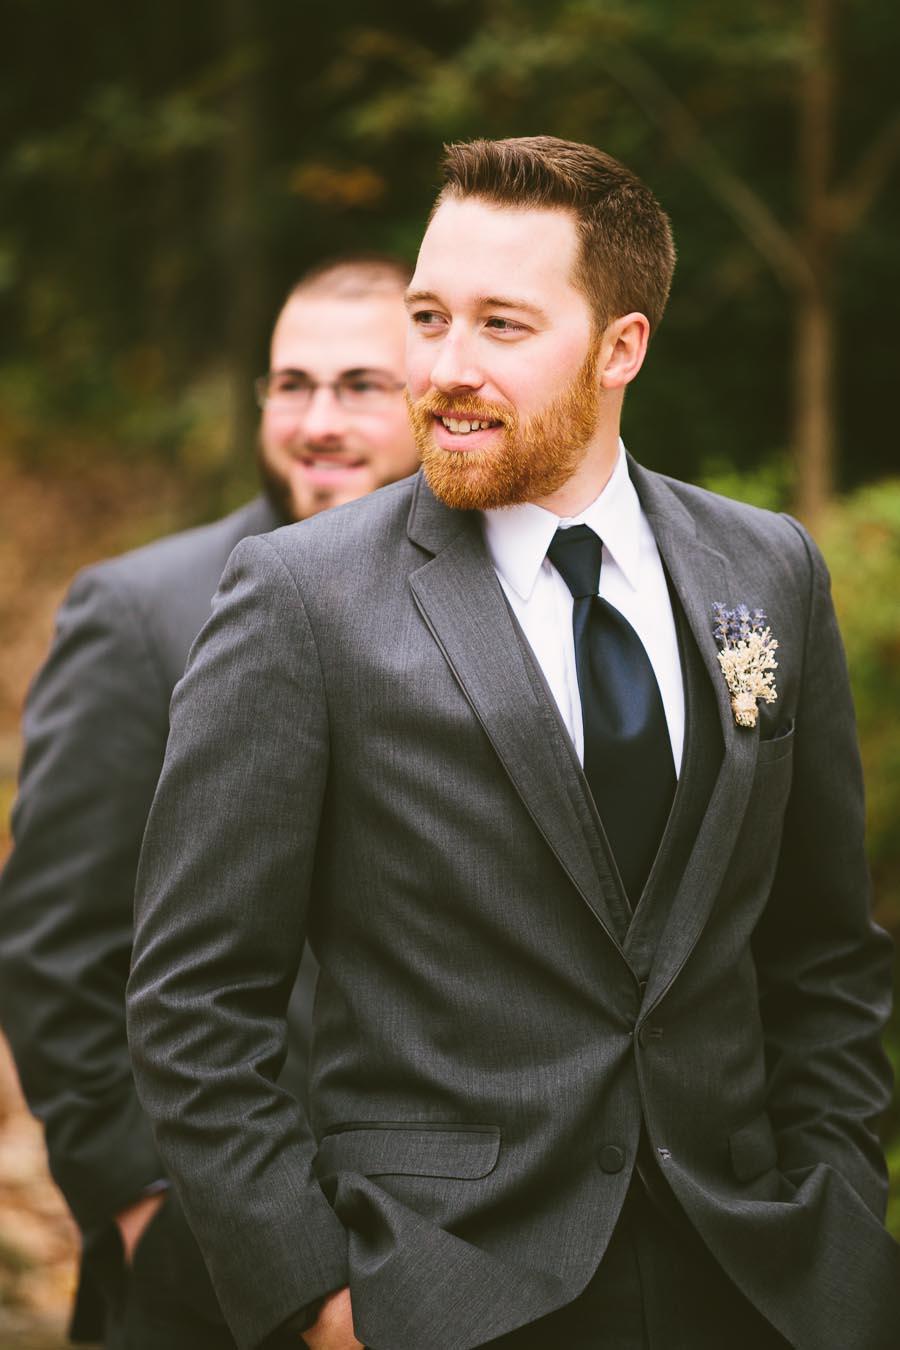 landolls-mohican-castle-wedding-photography-43.jpg